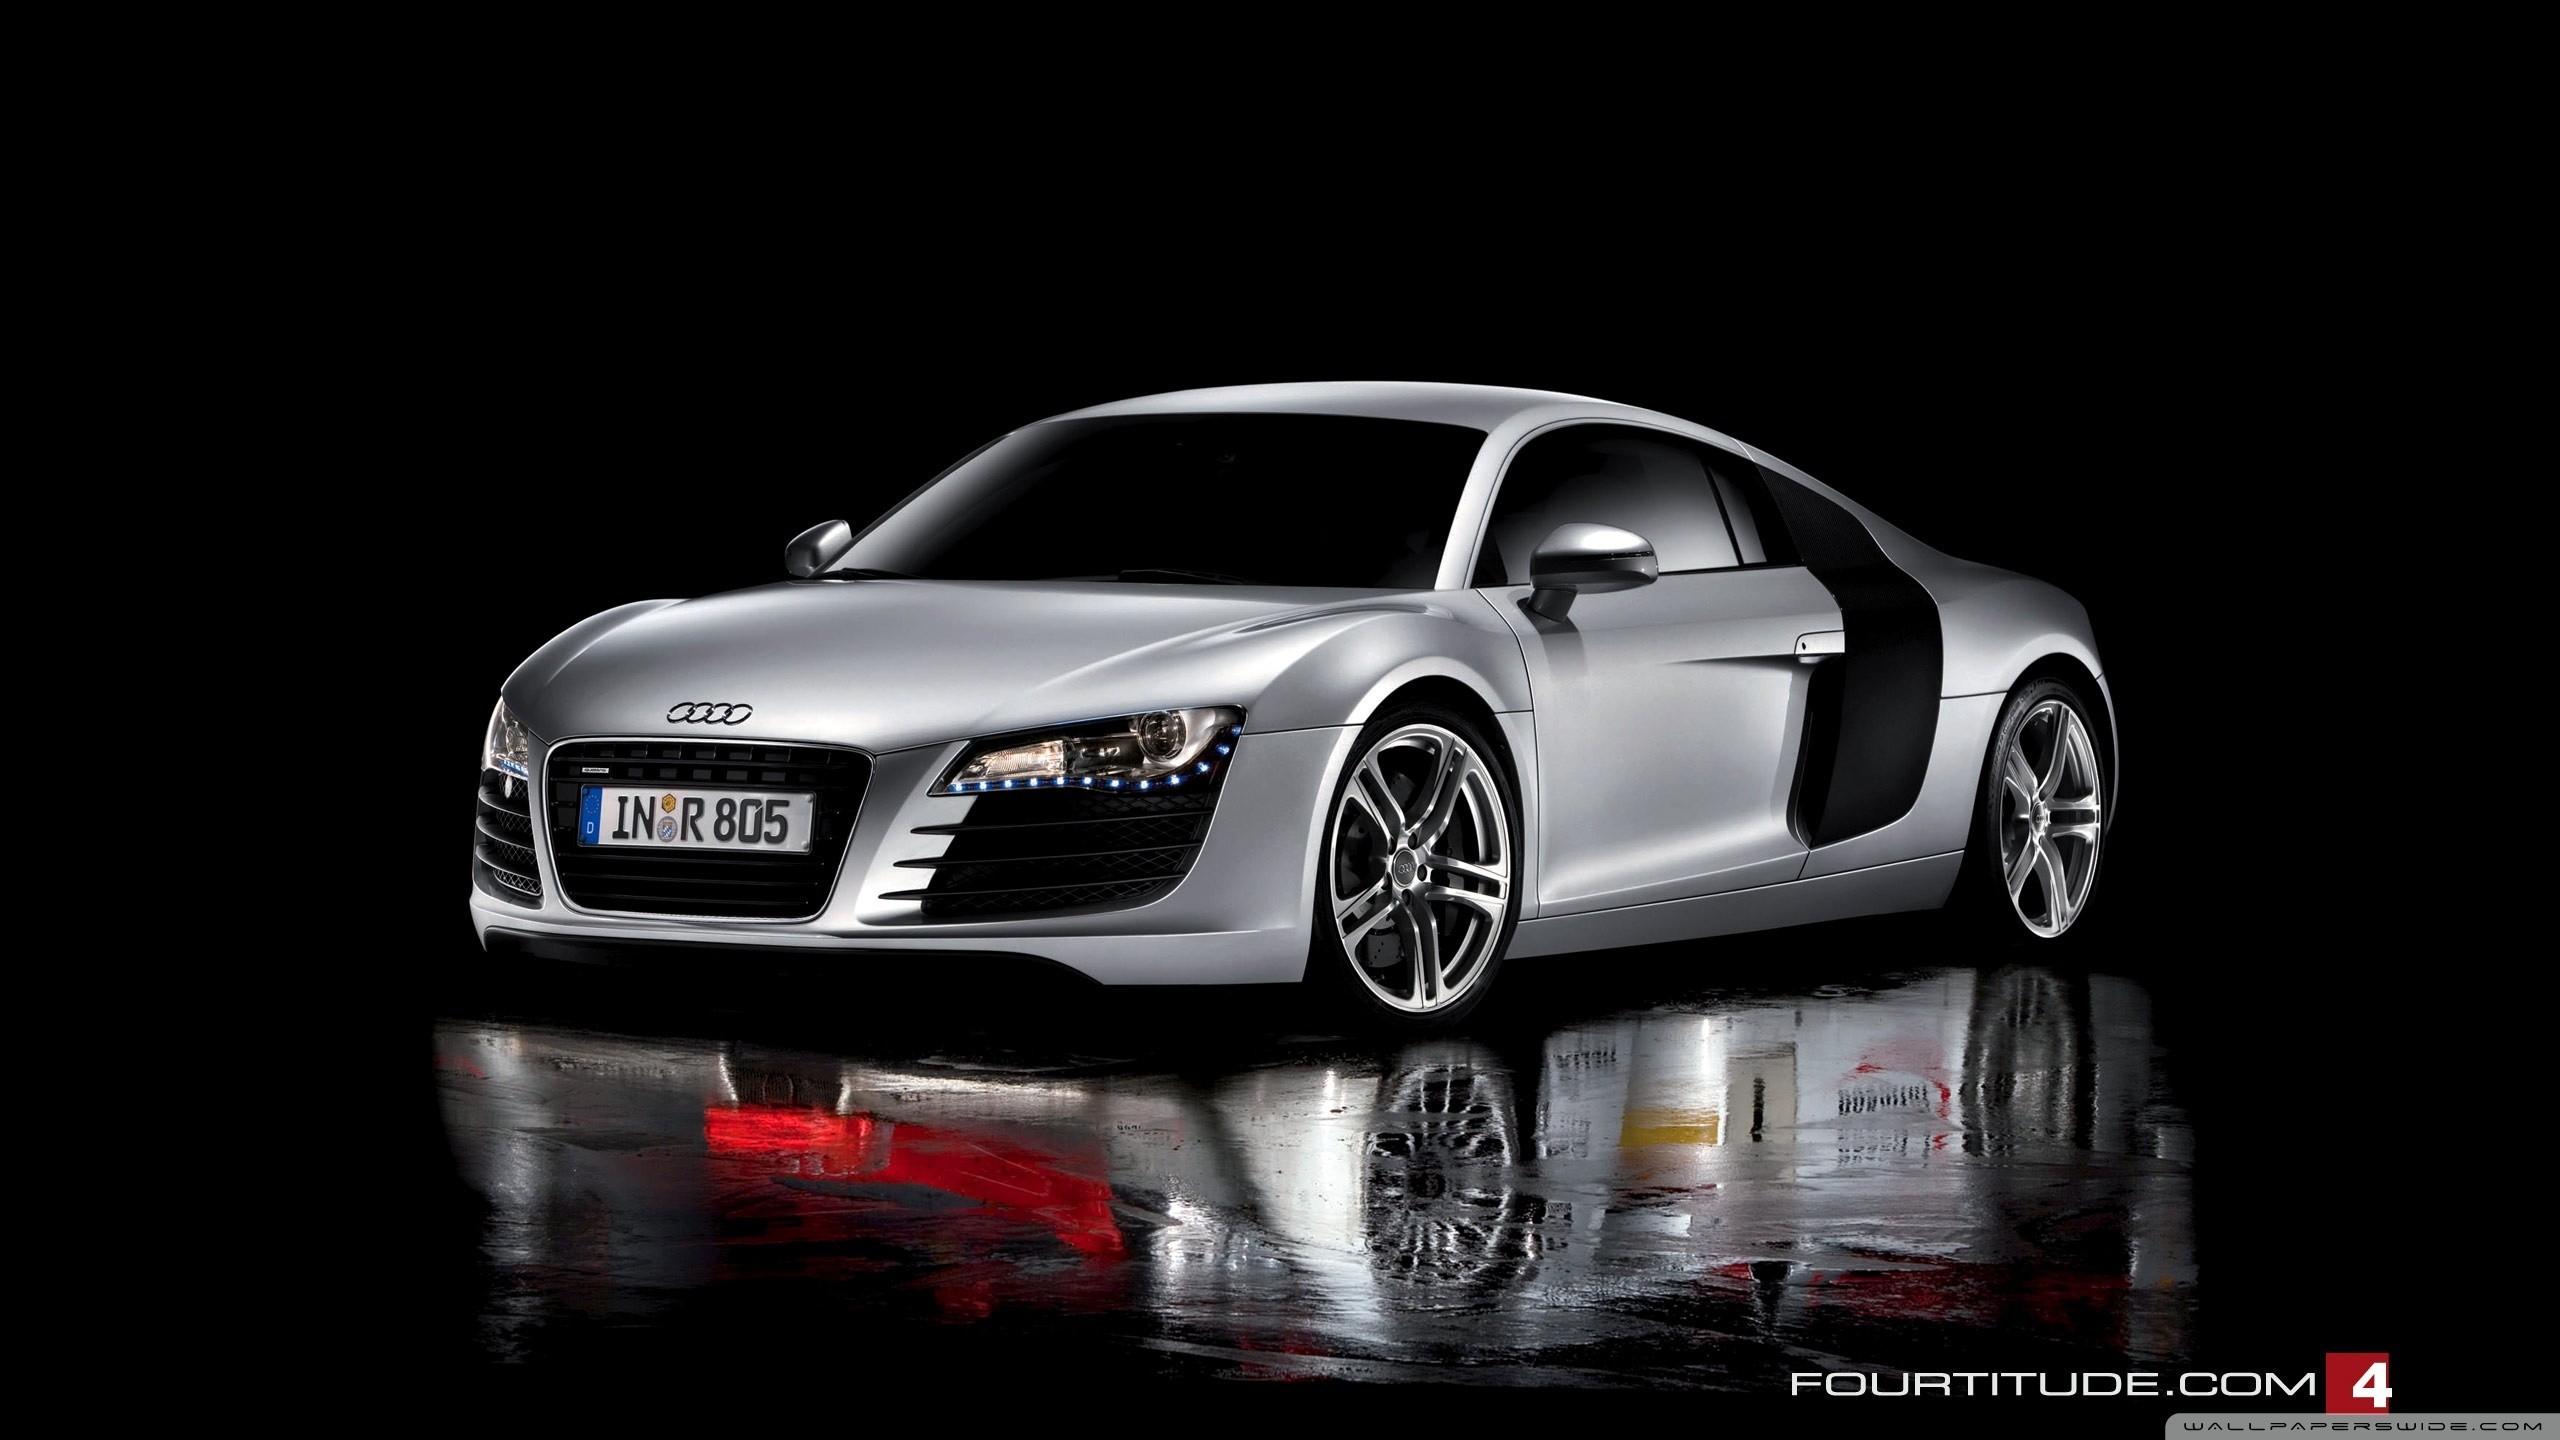 Res: 2560x1440, ... Amazing Wallpapers for Pc Desktop New Audi R8 Car 7 â ¤ 4k Hd Desktop  Wallpaper